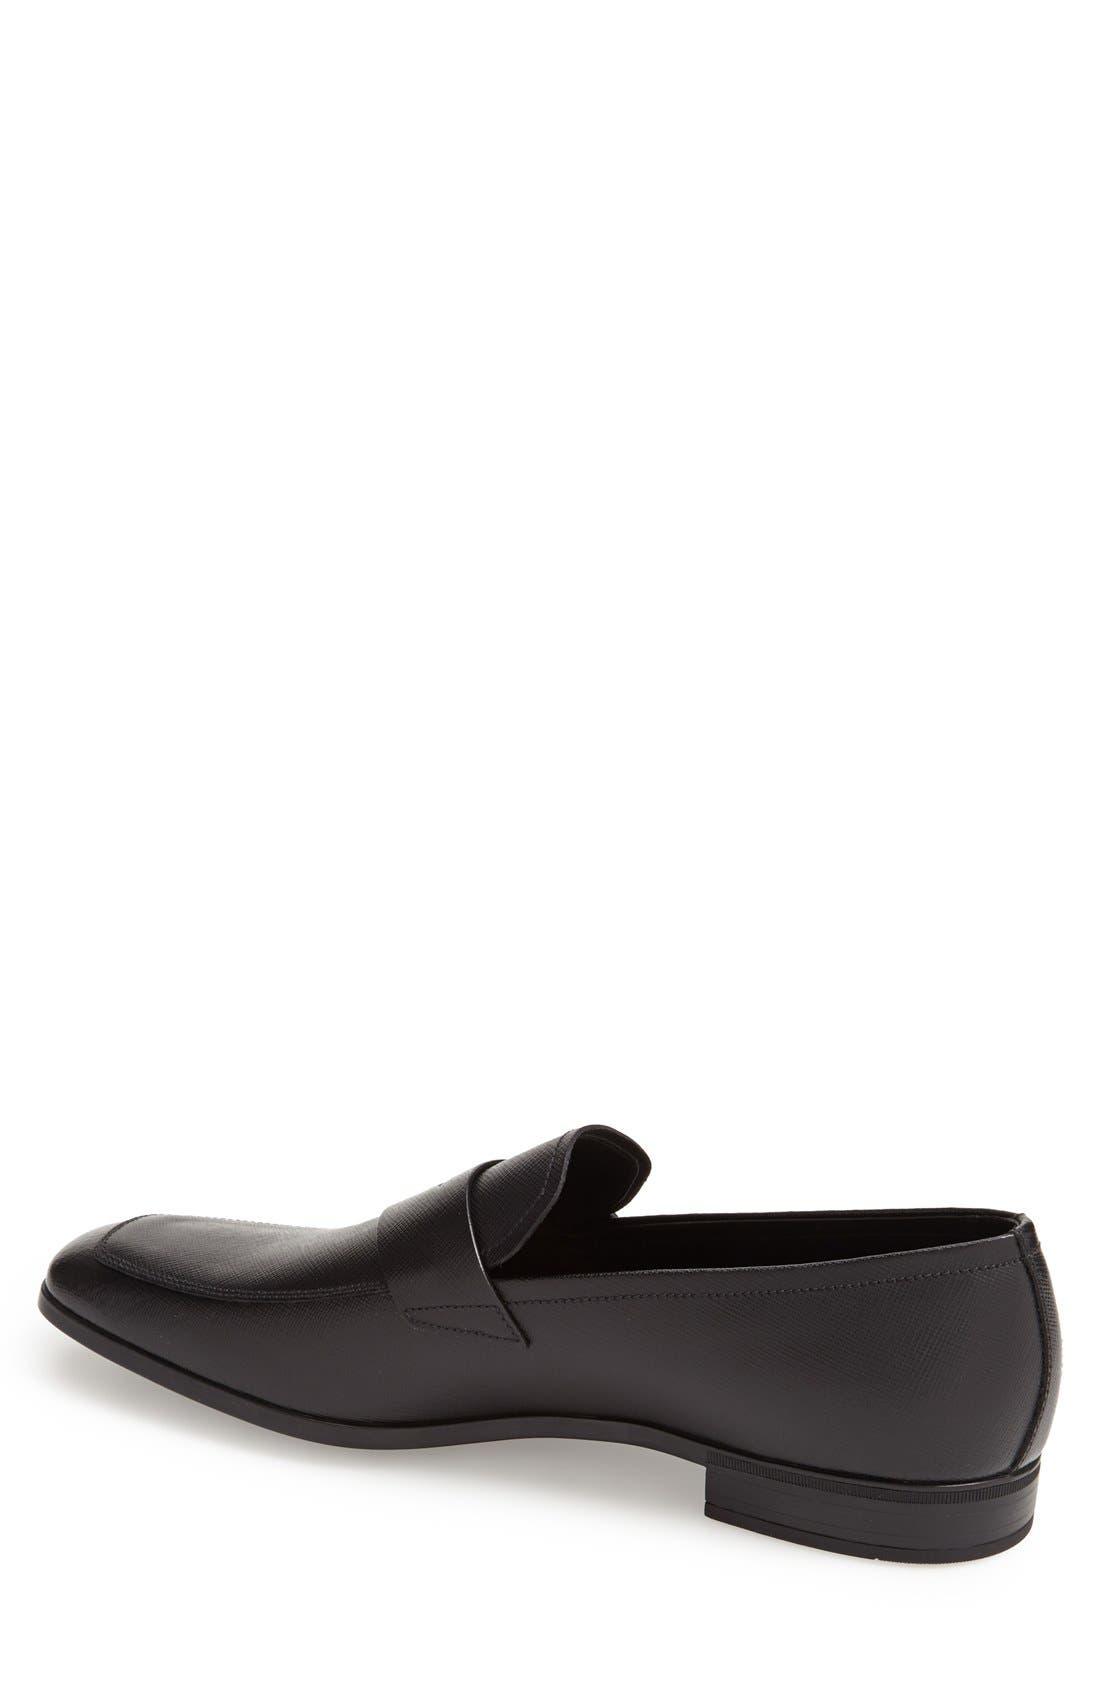 Alternate Image 2  - Prada Saffiano Leather Penny Loafer (Men)